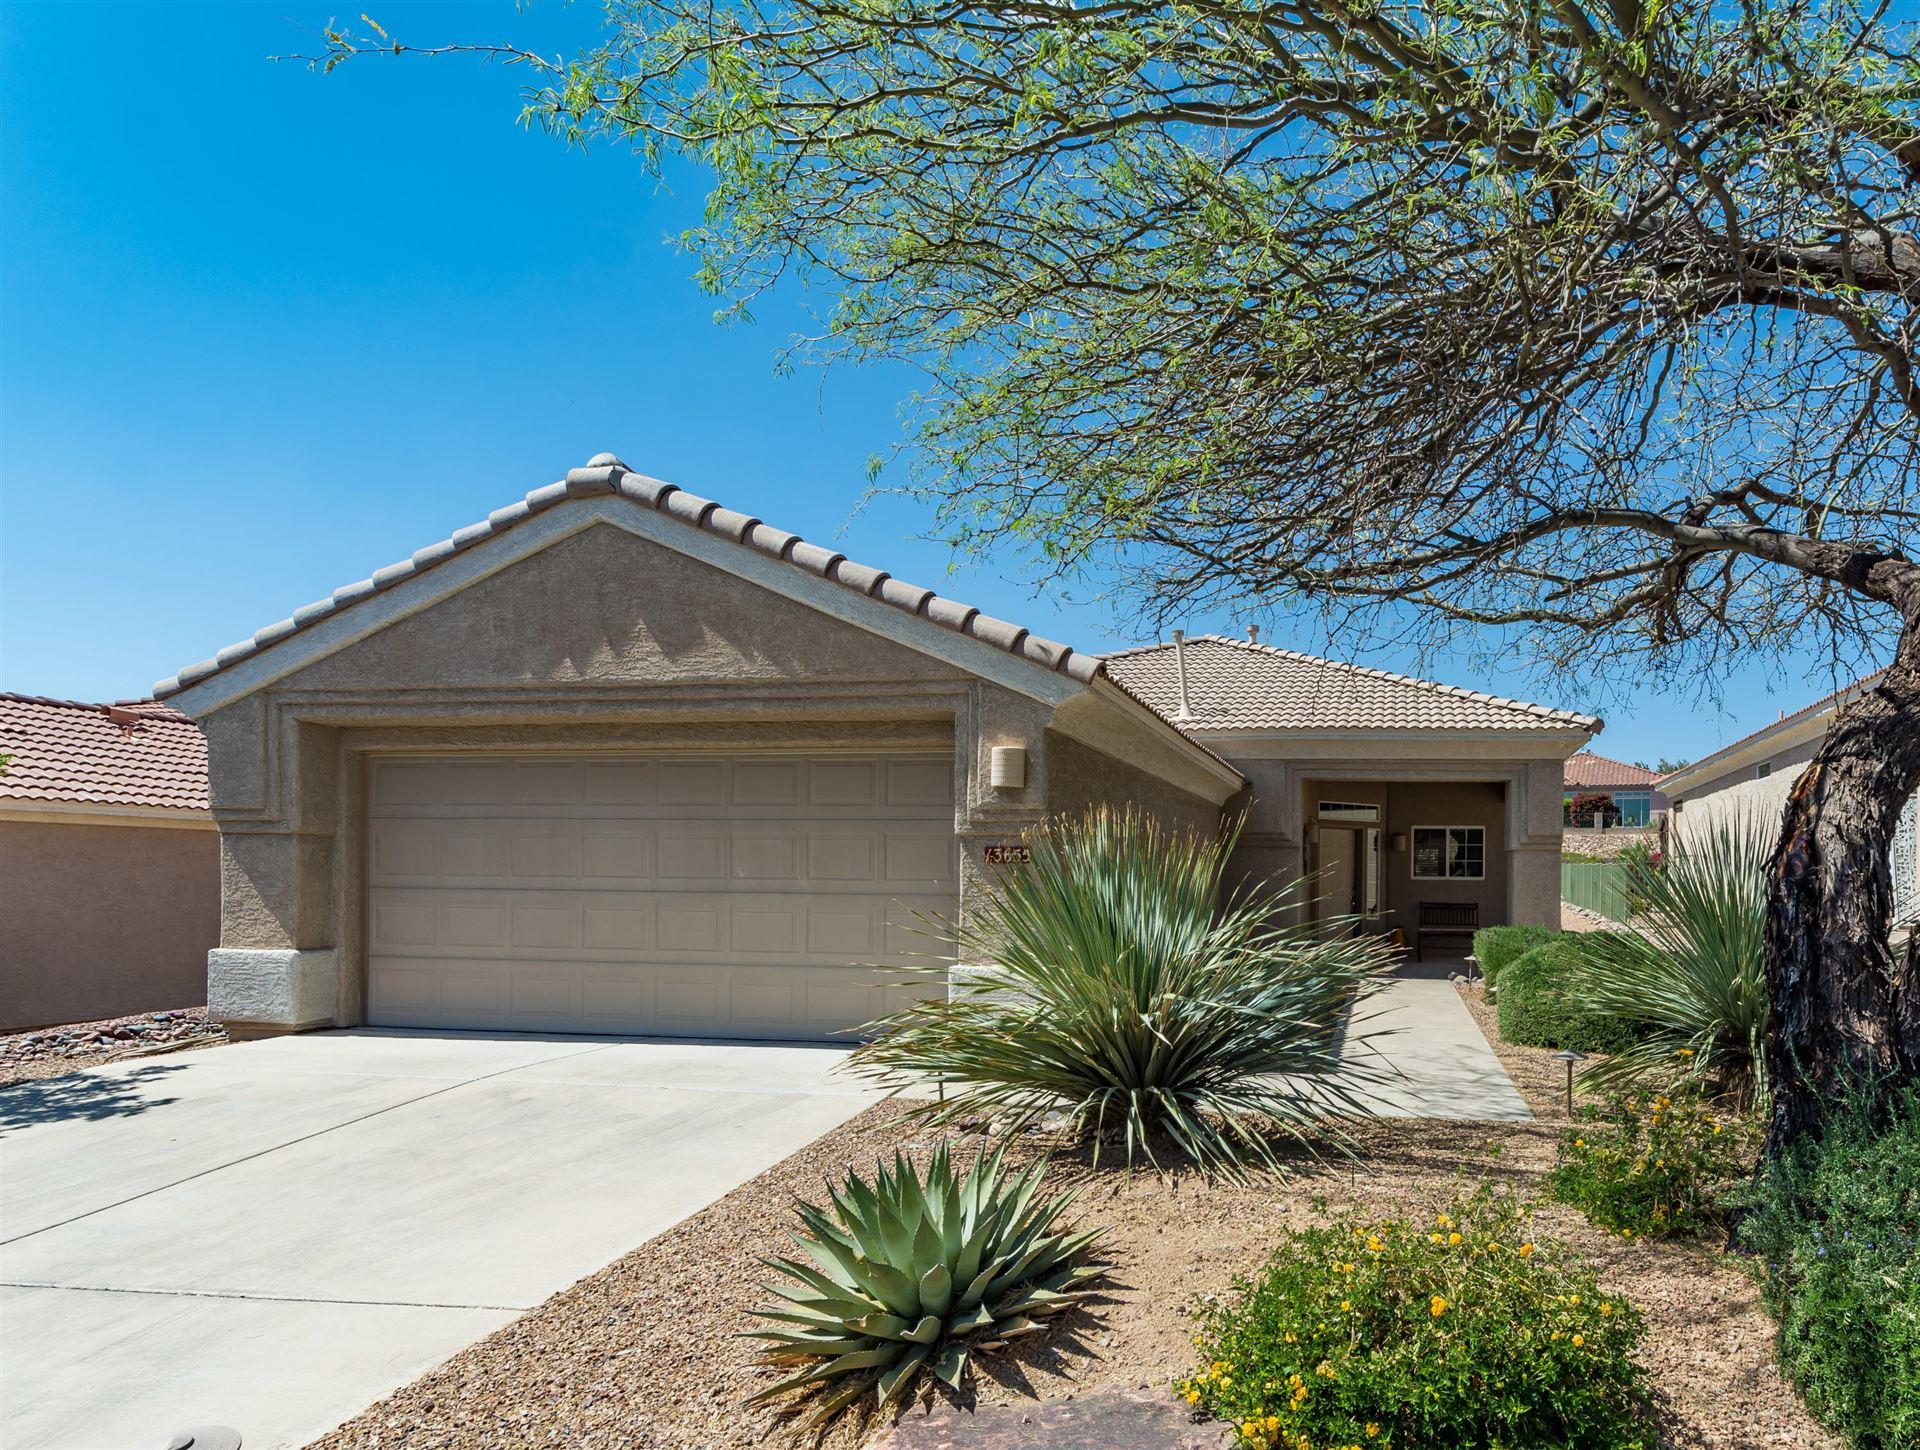 13655 N Gold Cholla Place, Marana, AZ 85658 - MLS#: 22112024